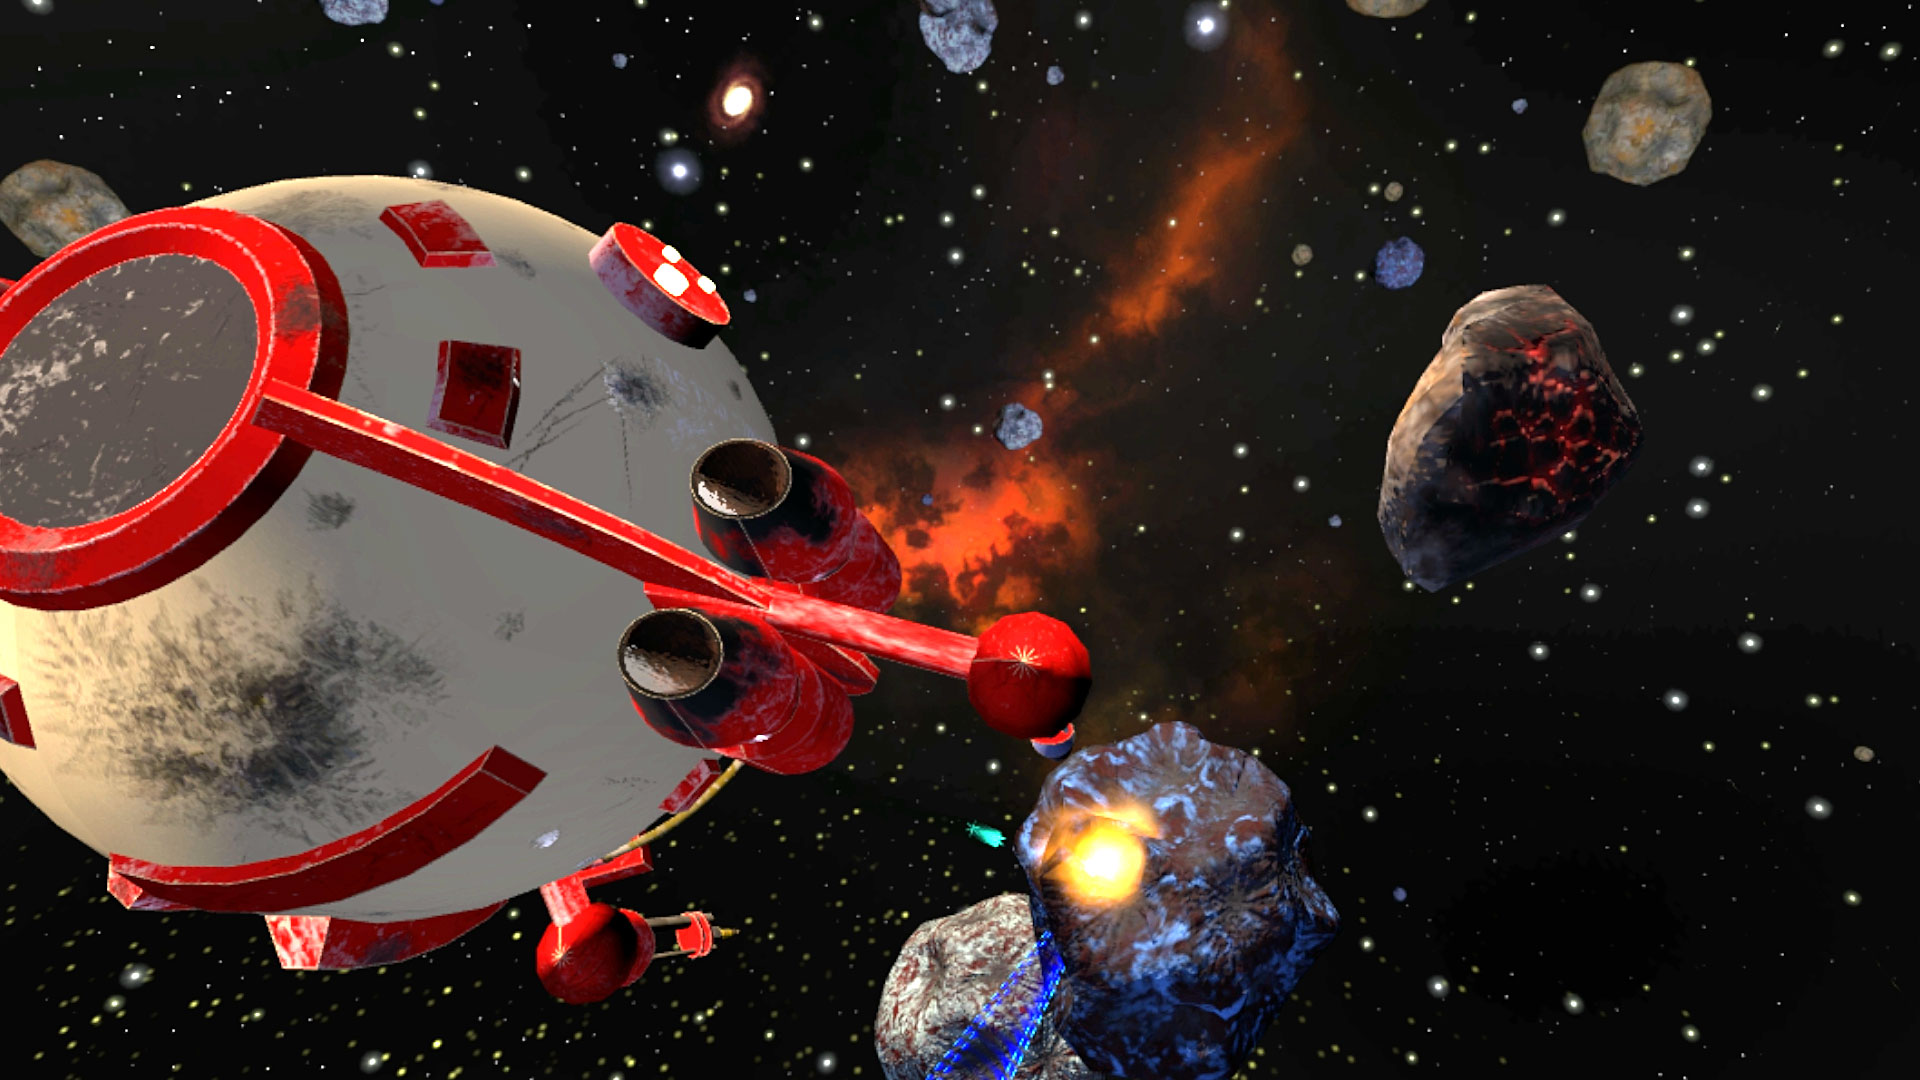 Oculus Quest 游戏《Space Junk》宇宙垃圾插图(1)